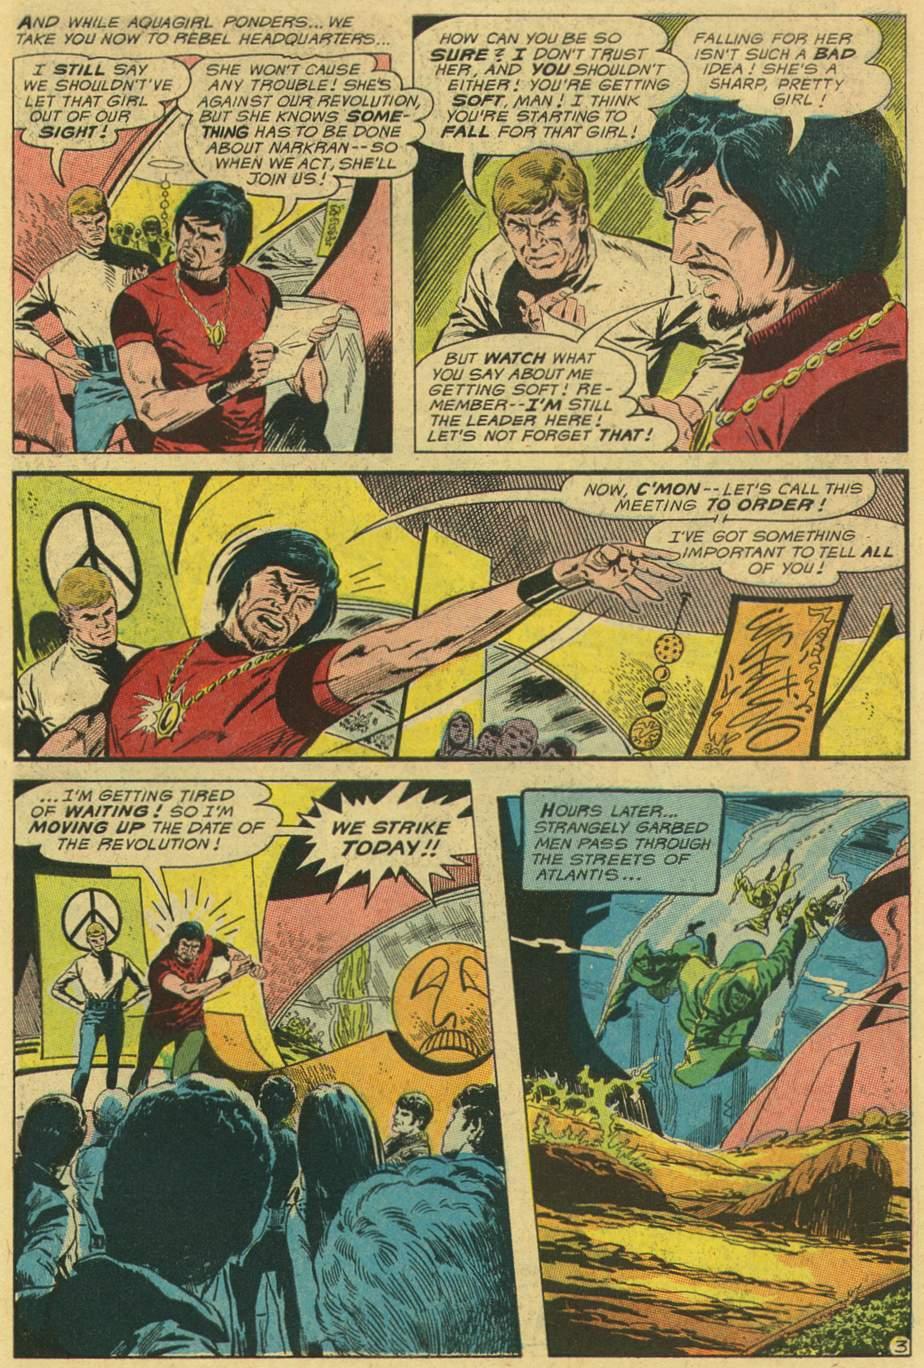 Read online Aquaman (1962) comic -  Issue #47 - 5